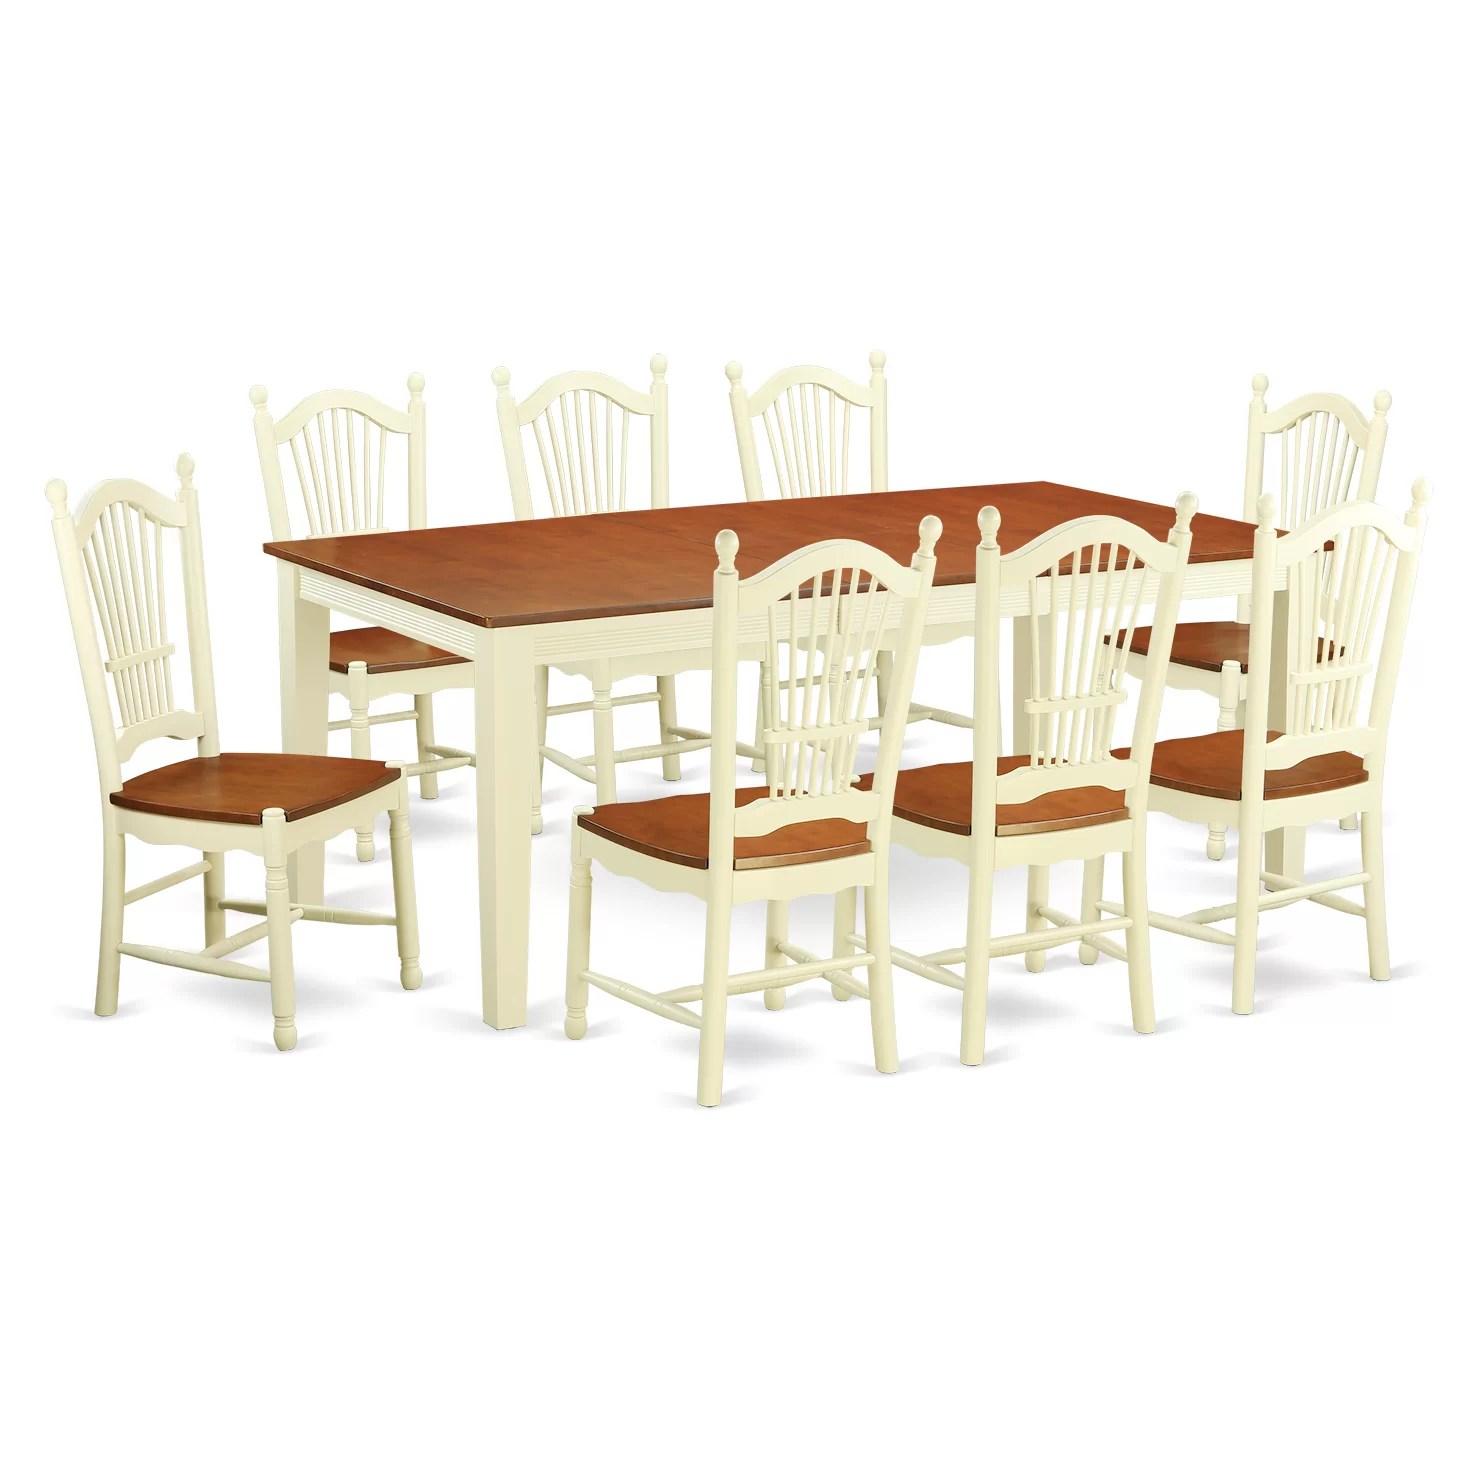 8 chair kitchen table delta bronze faucet east west quincy 9 piece dining set wayfair